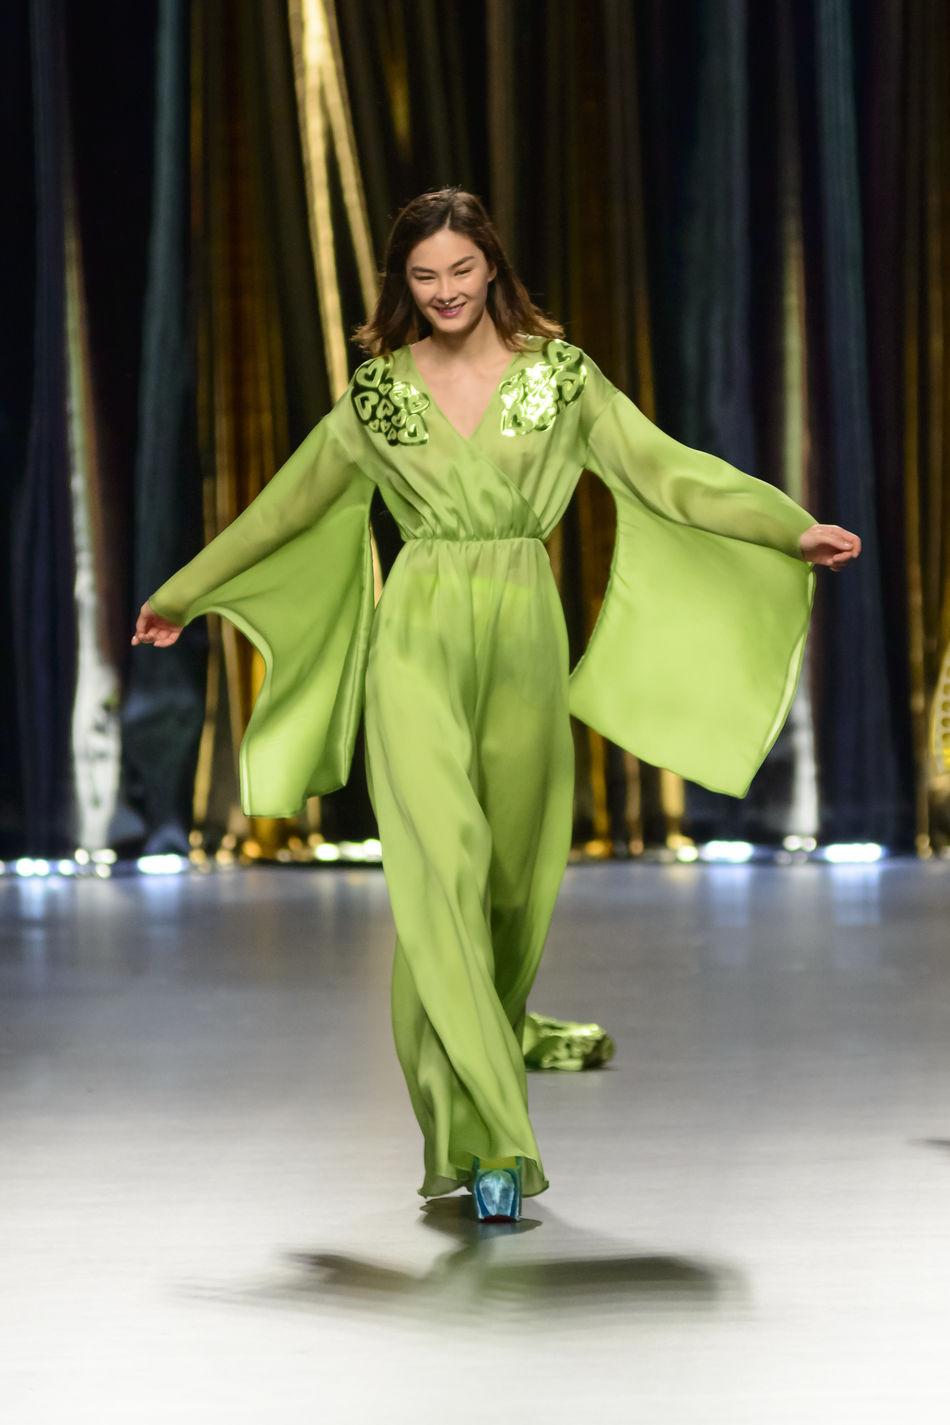 Agatha Ruiz De La Prada - Merecedes Benz Fashion Week Madrid 2016 - Autumn-Winter 2016-2017. Catwalk Clothes Editorial  Fashion Fashion Show Fashion Week Full Length Mbfw Mbfw2016 Mercedes Benz Fashion Week Models Portrait Standing Woman Women Young Adult